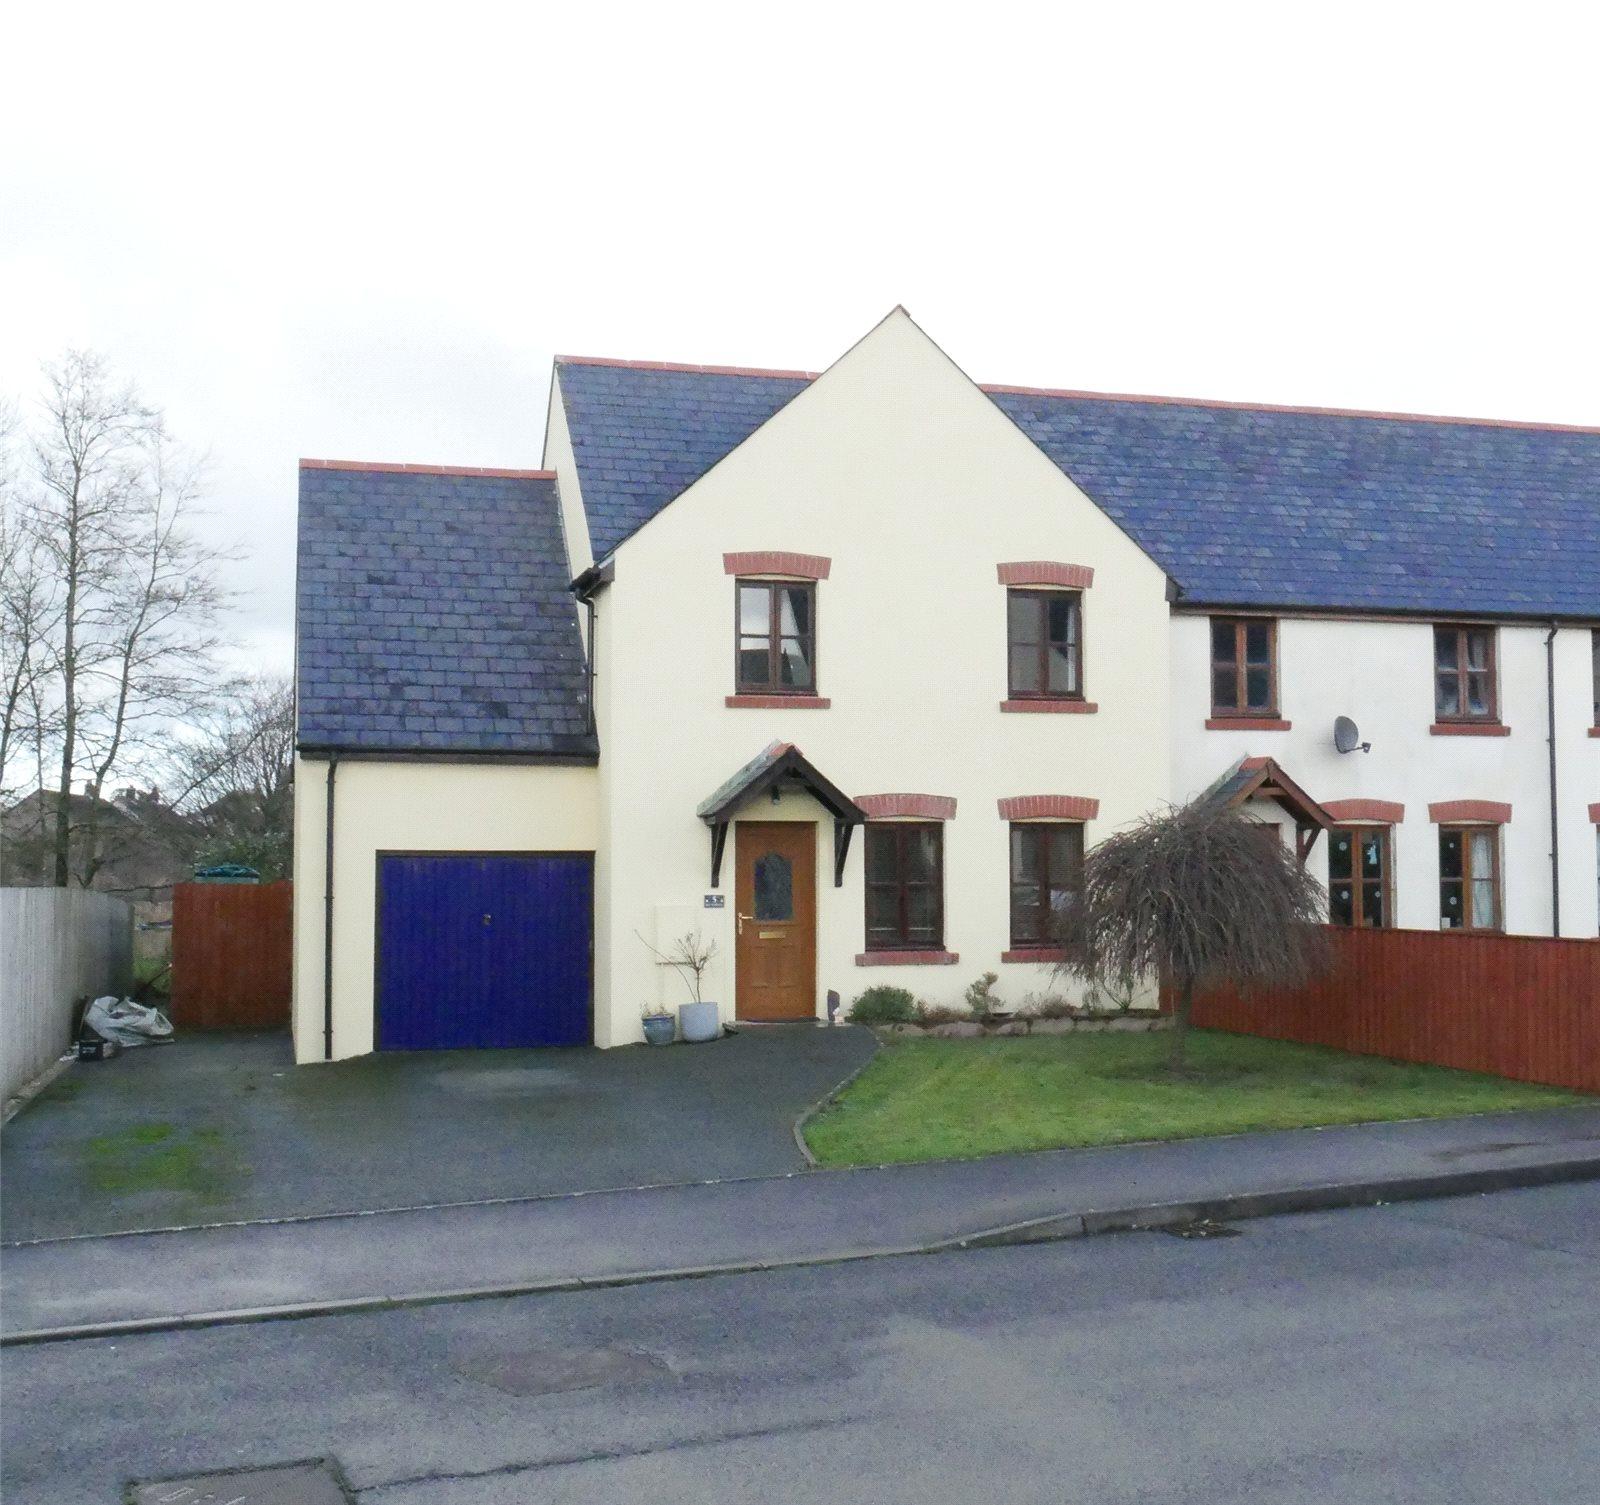 4 Bedrooms End Of Terrace House for sale in Bro'r Dderwen, Clynderwen, Pembrokeshire